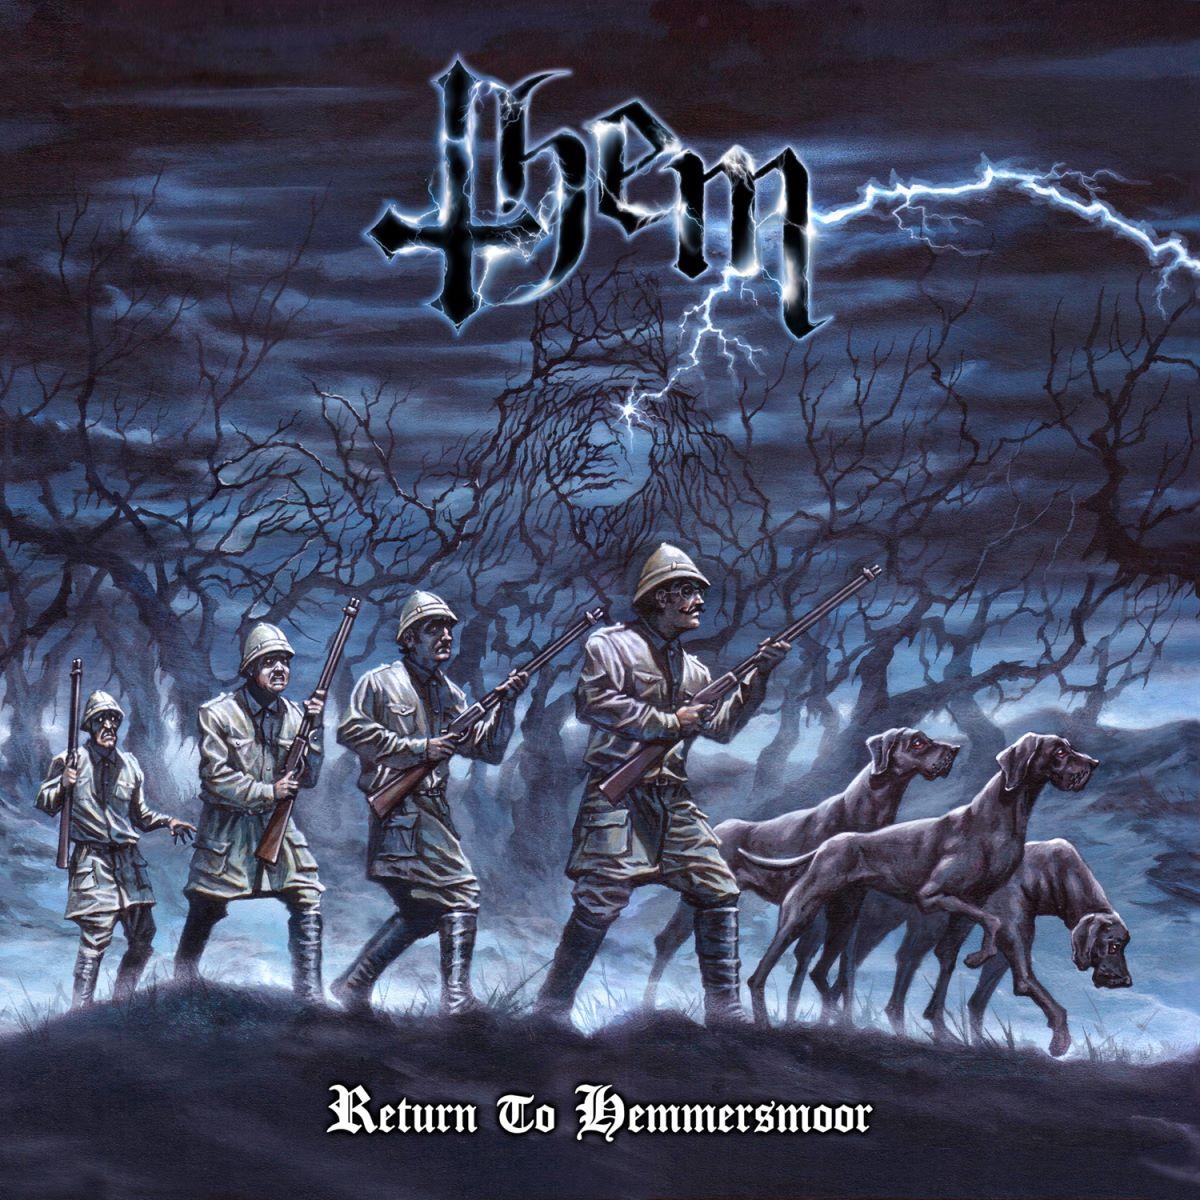 THEM - Return To Hemmersmoor - album cover